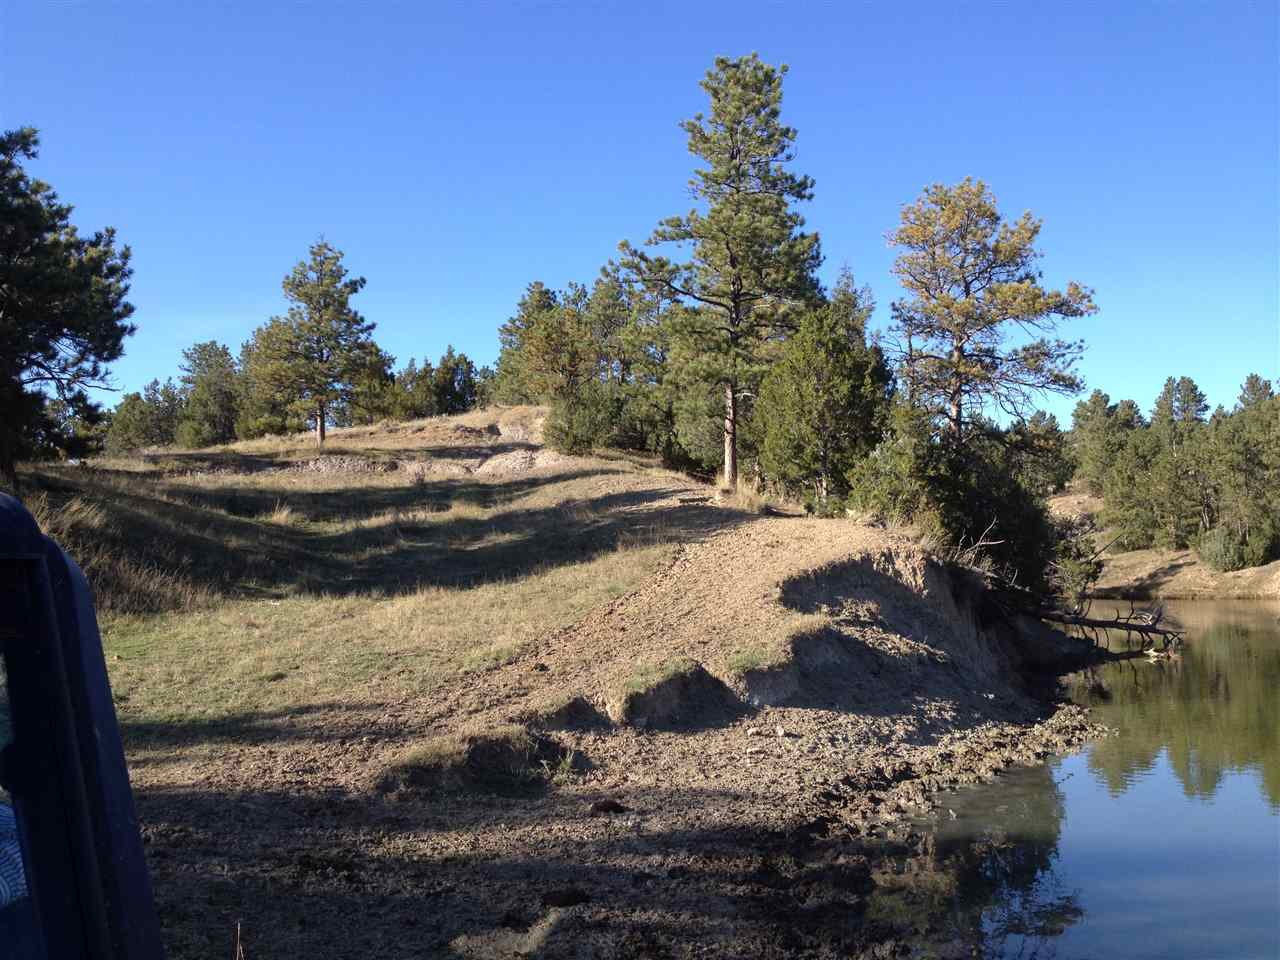 Bowers Creek